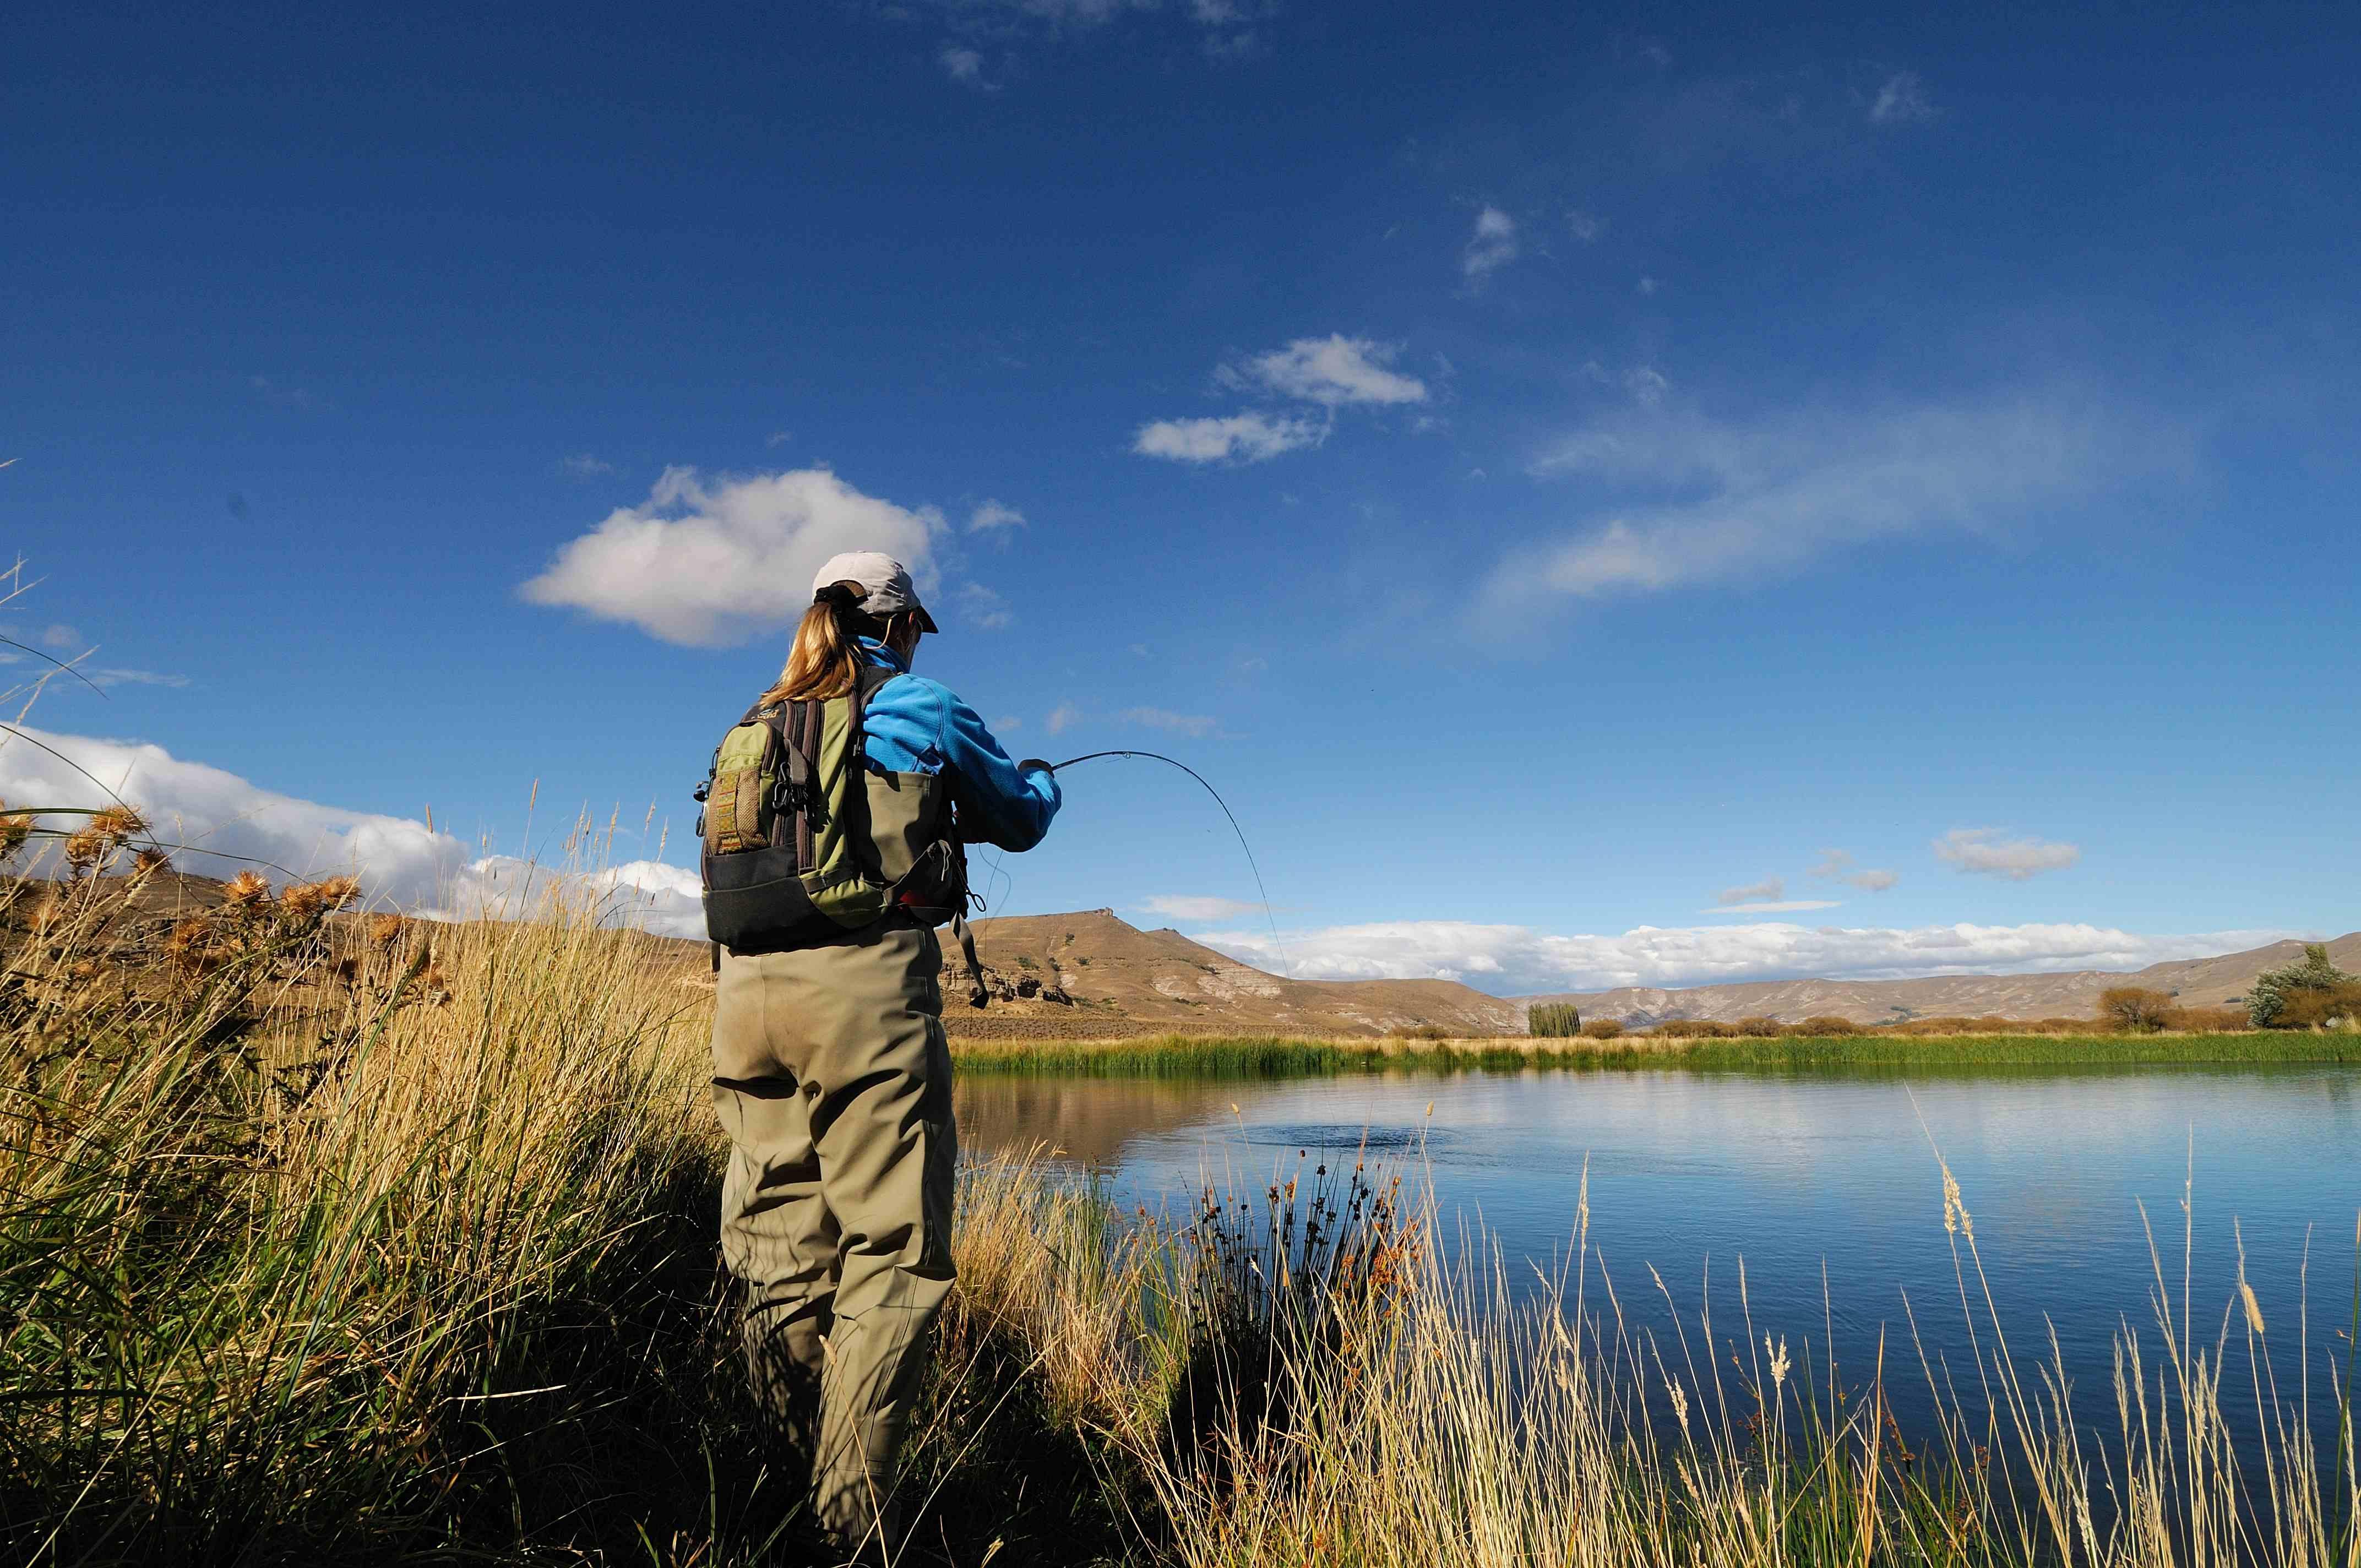 Tipiliuke ranch patagonia argentina fly fishing for Fly fishing argentina